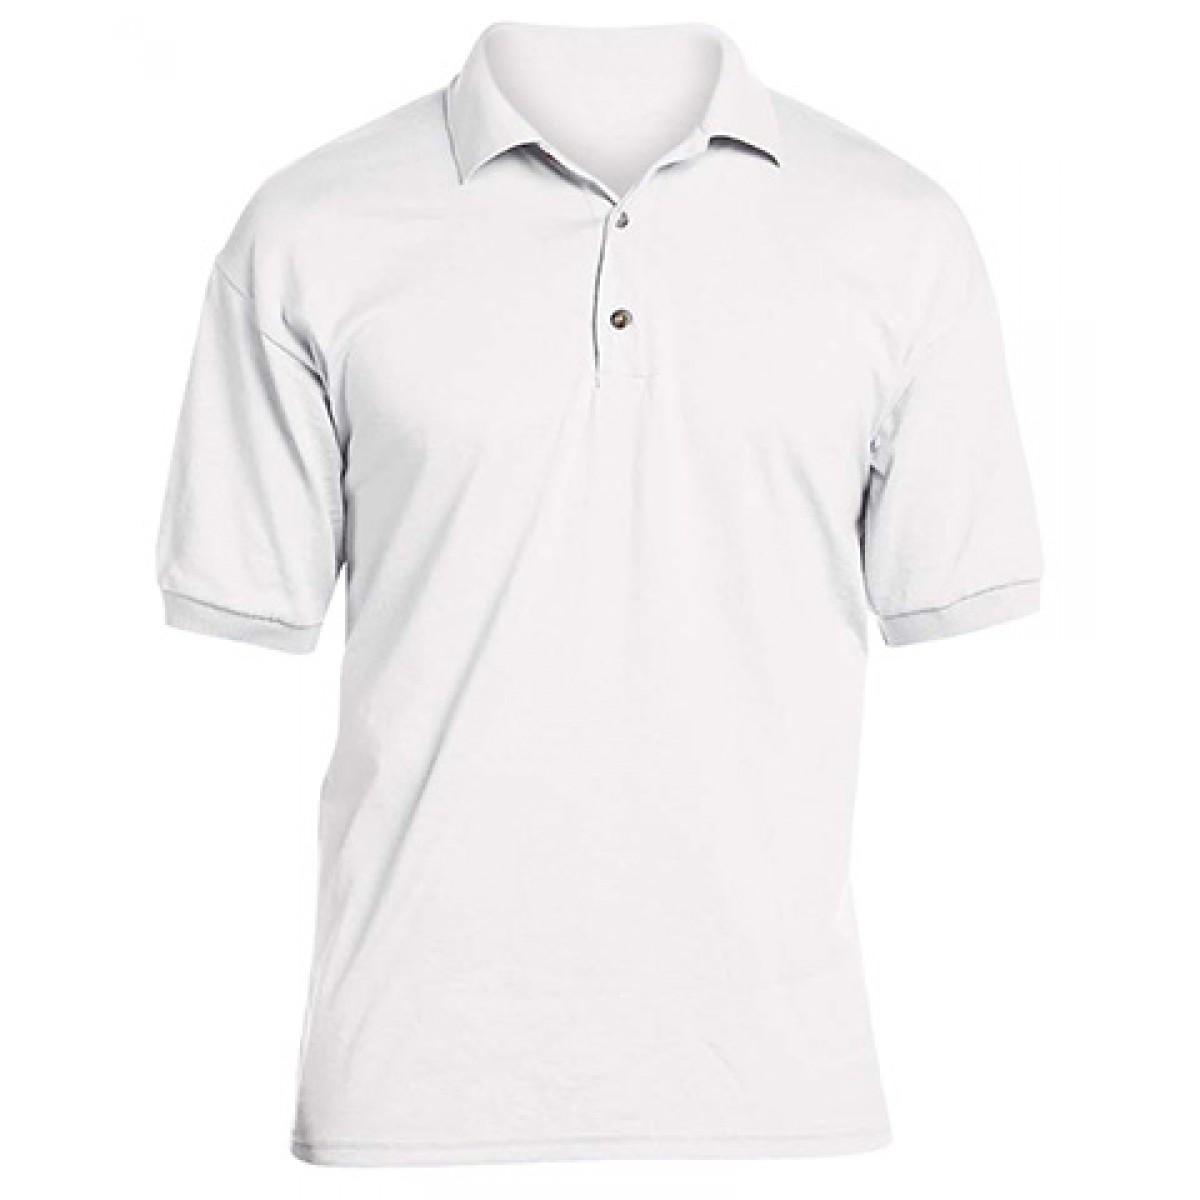 Jersey Polo 50/50 -White-YM